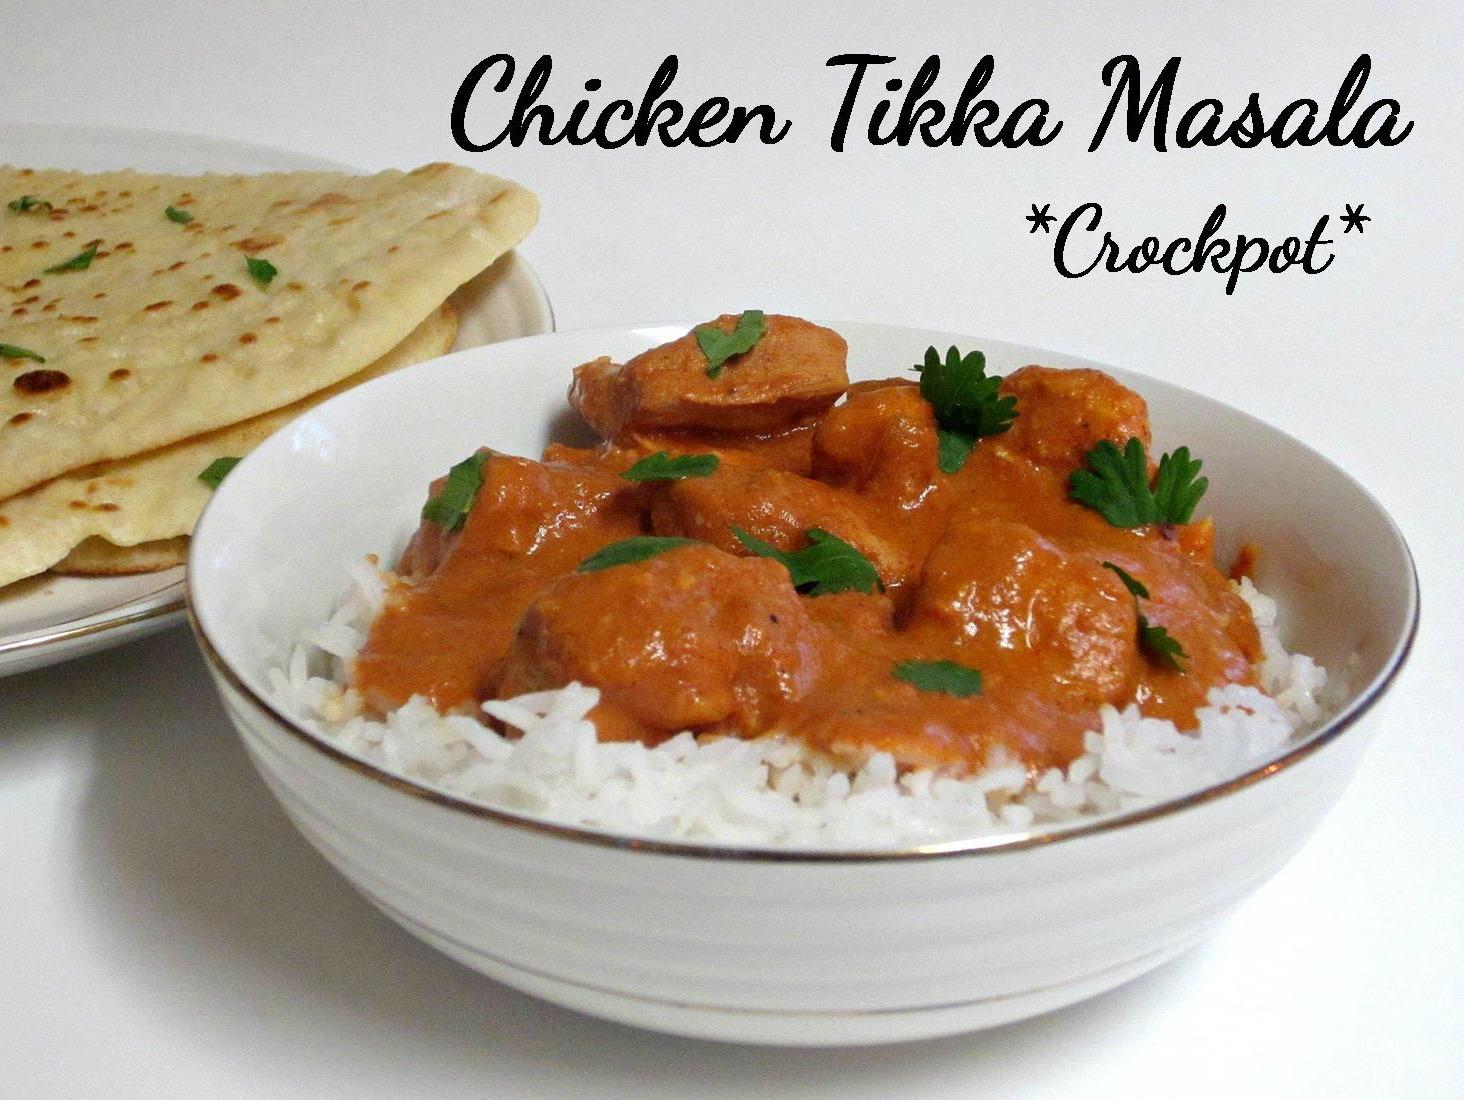 Chicken Tikka Masala At Whole Foods